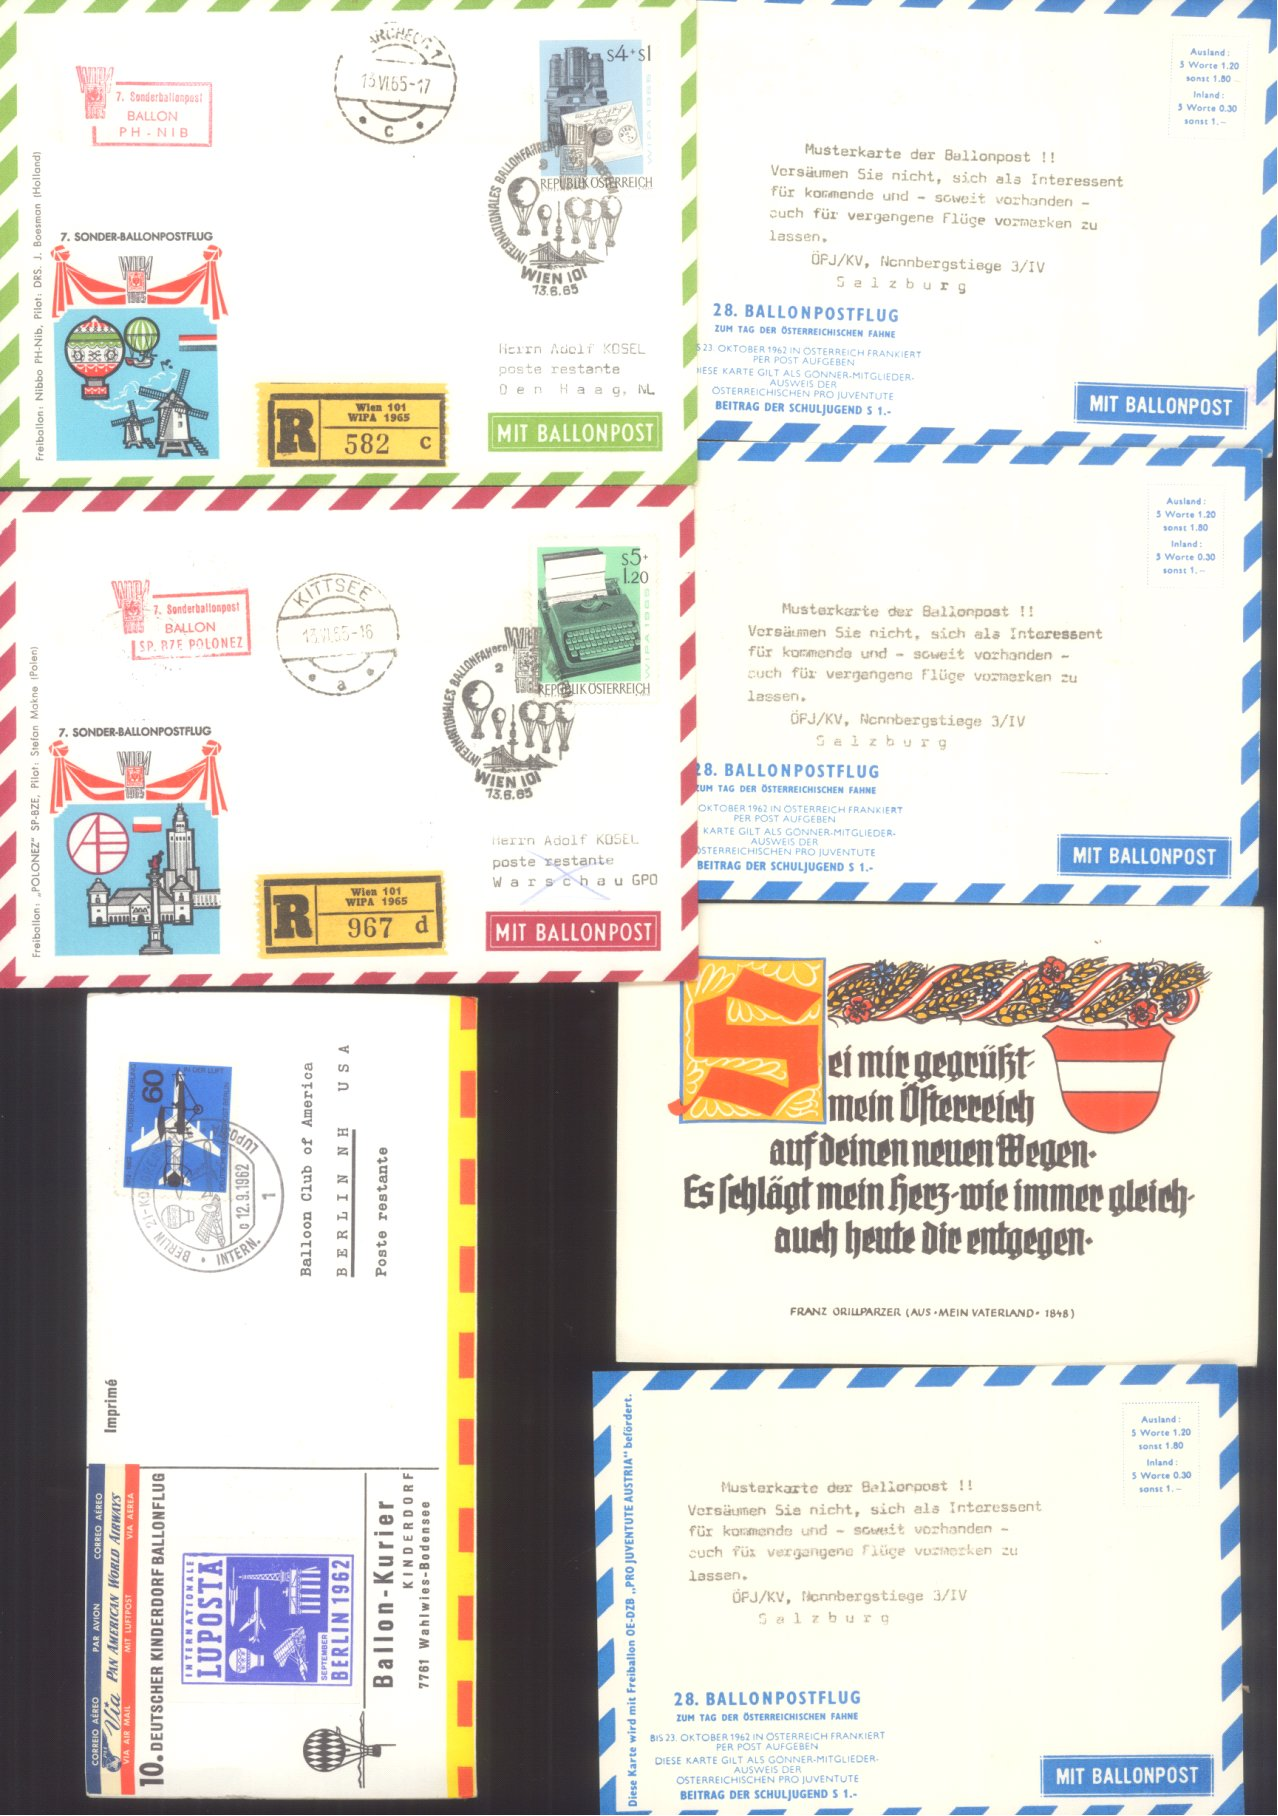 MOTIV BALLONPOST / KINDERDORF BALLONPOST 1952-1972-7